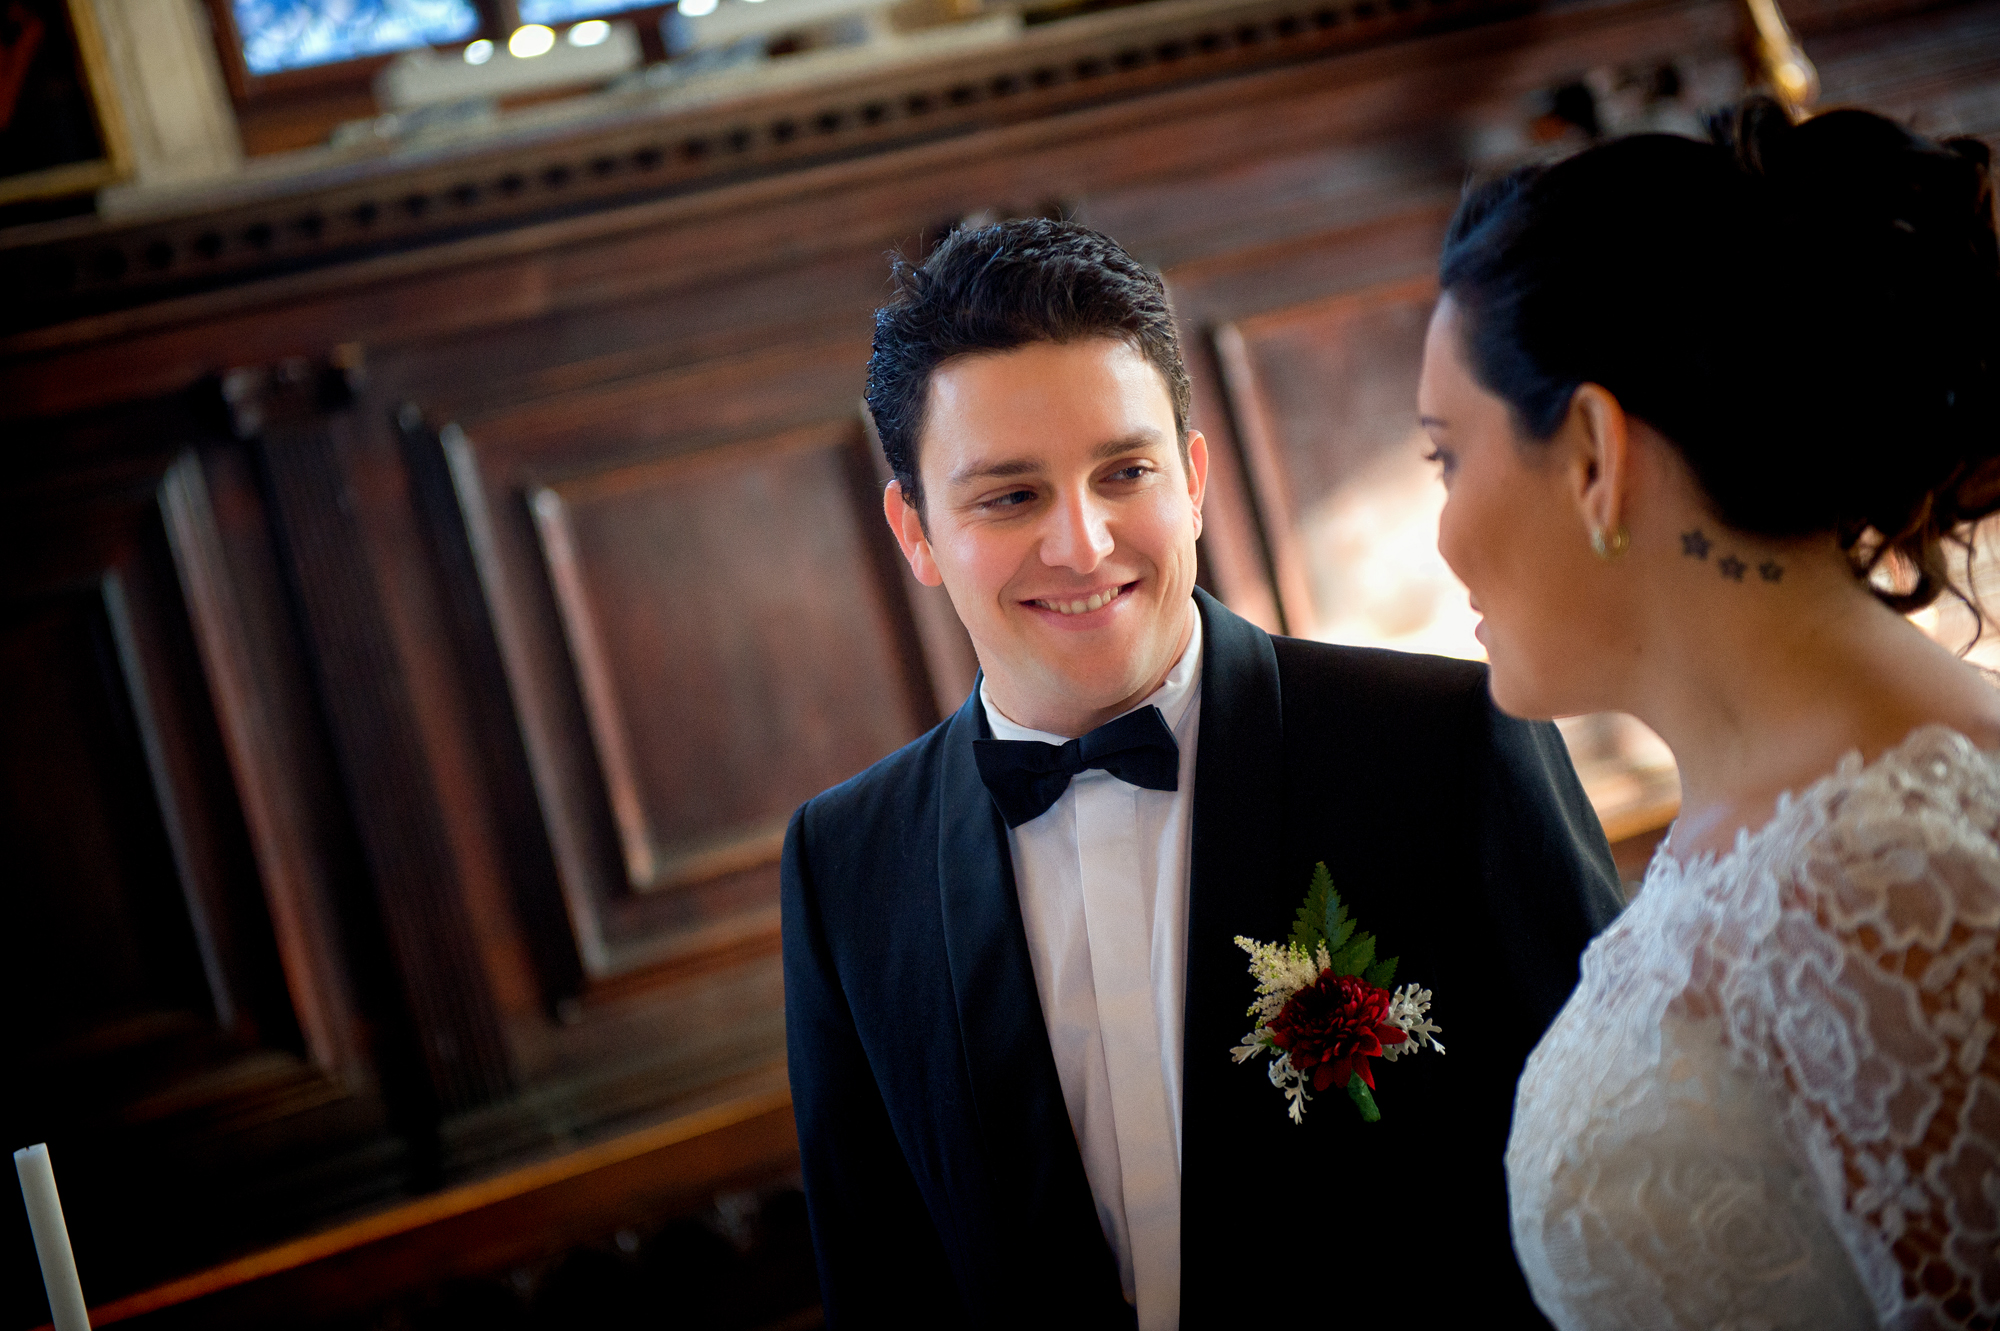 venezia matrimonio simbolico fotografia carmini laure jacquemin fotografo (9)